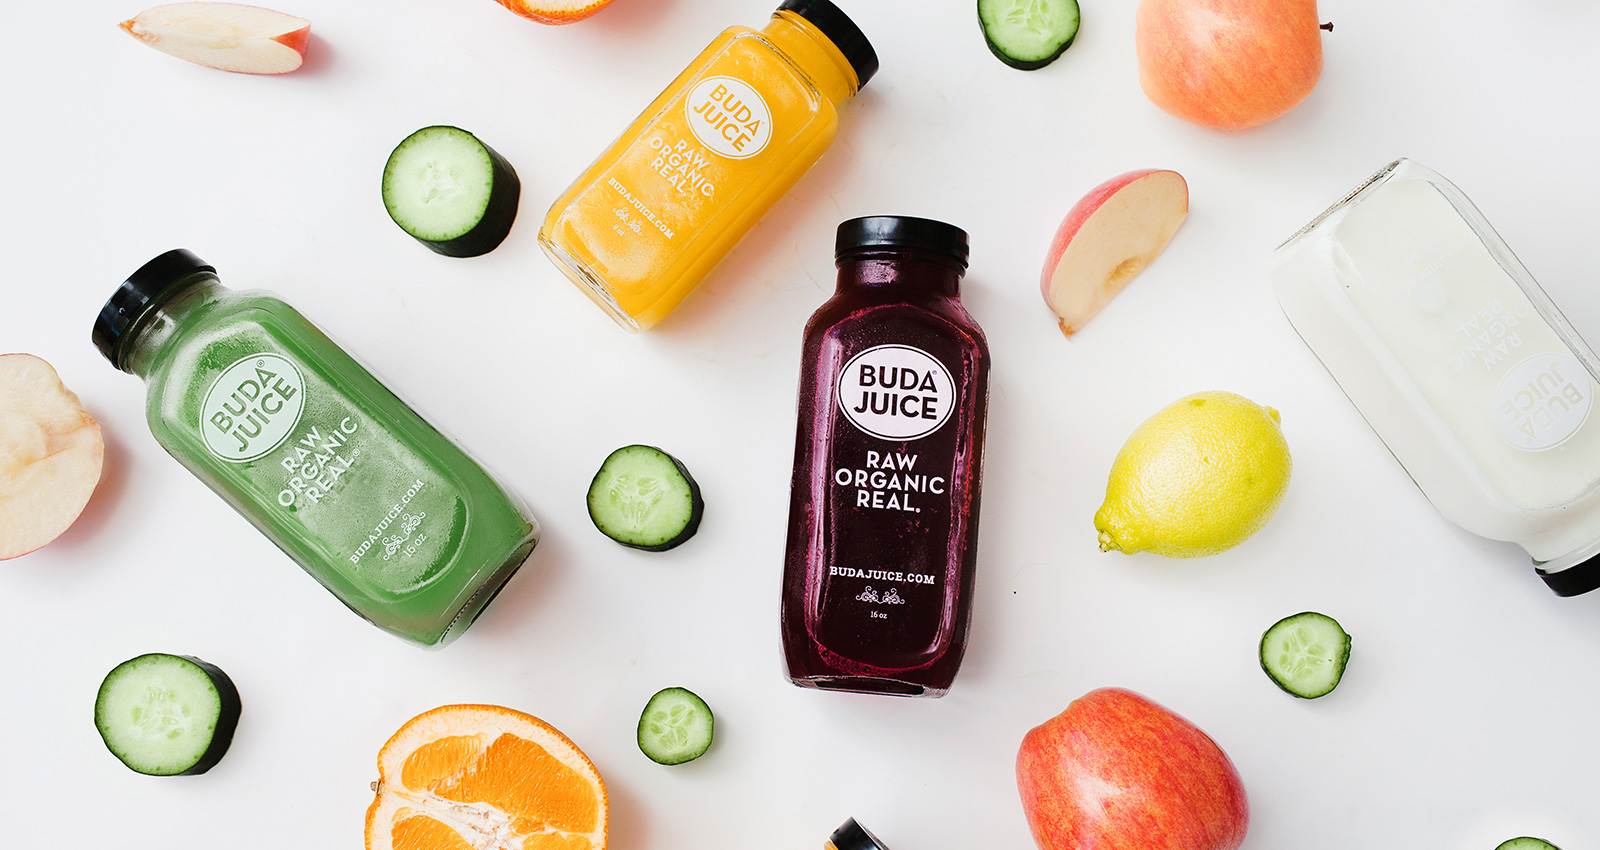 SandsRx Now Has Buda Juice